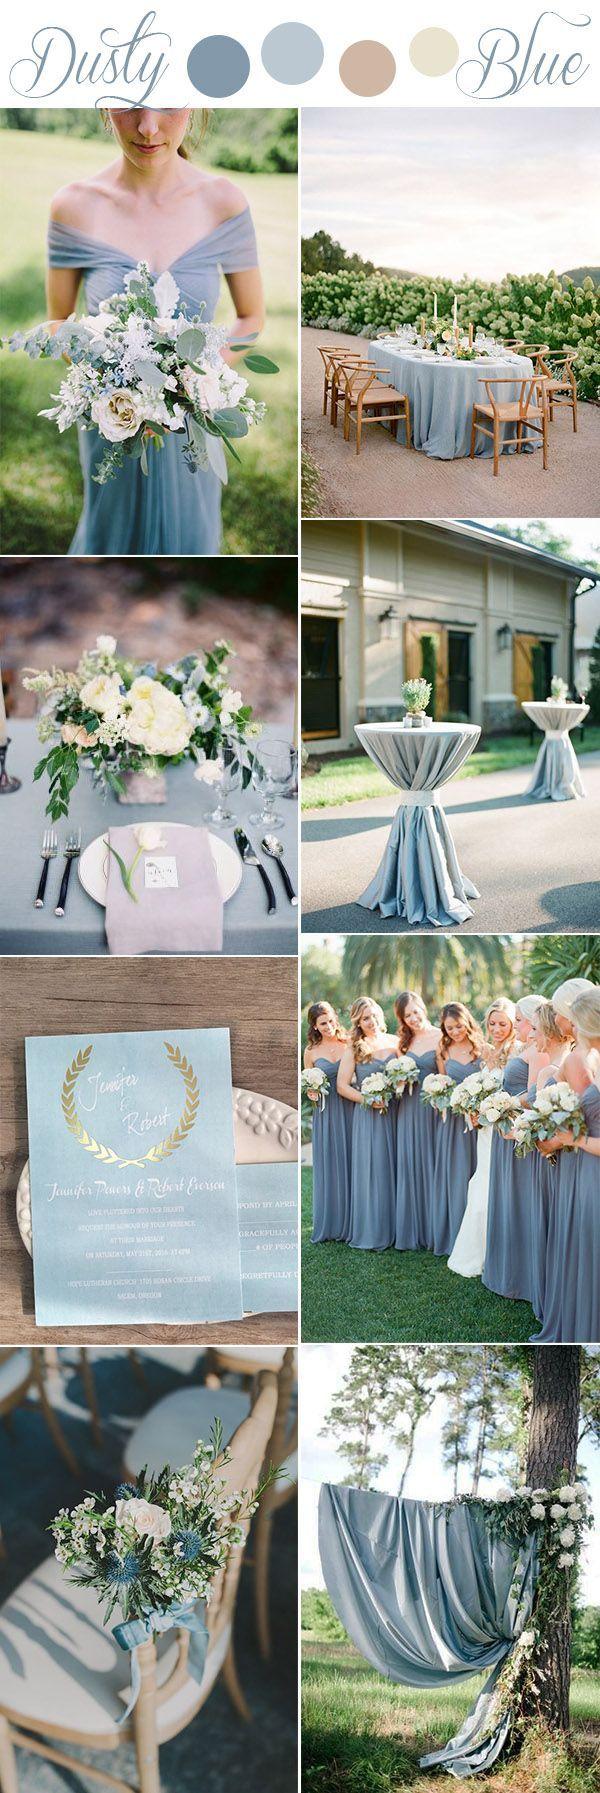 Wedding decorations reception october 2018 romantic softest dusty blue rustic wedding color ideas  Wedding